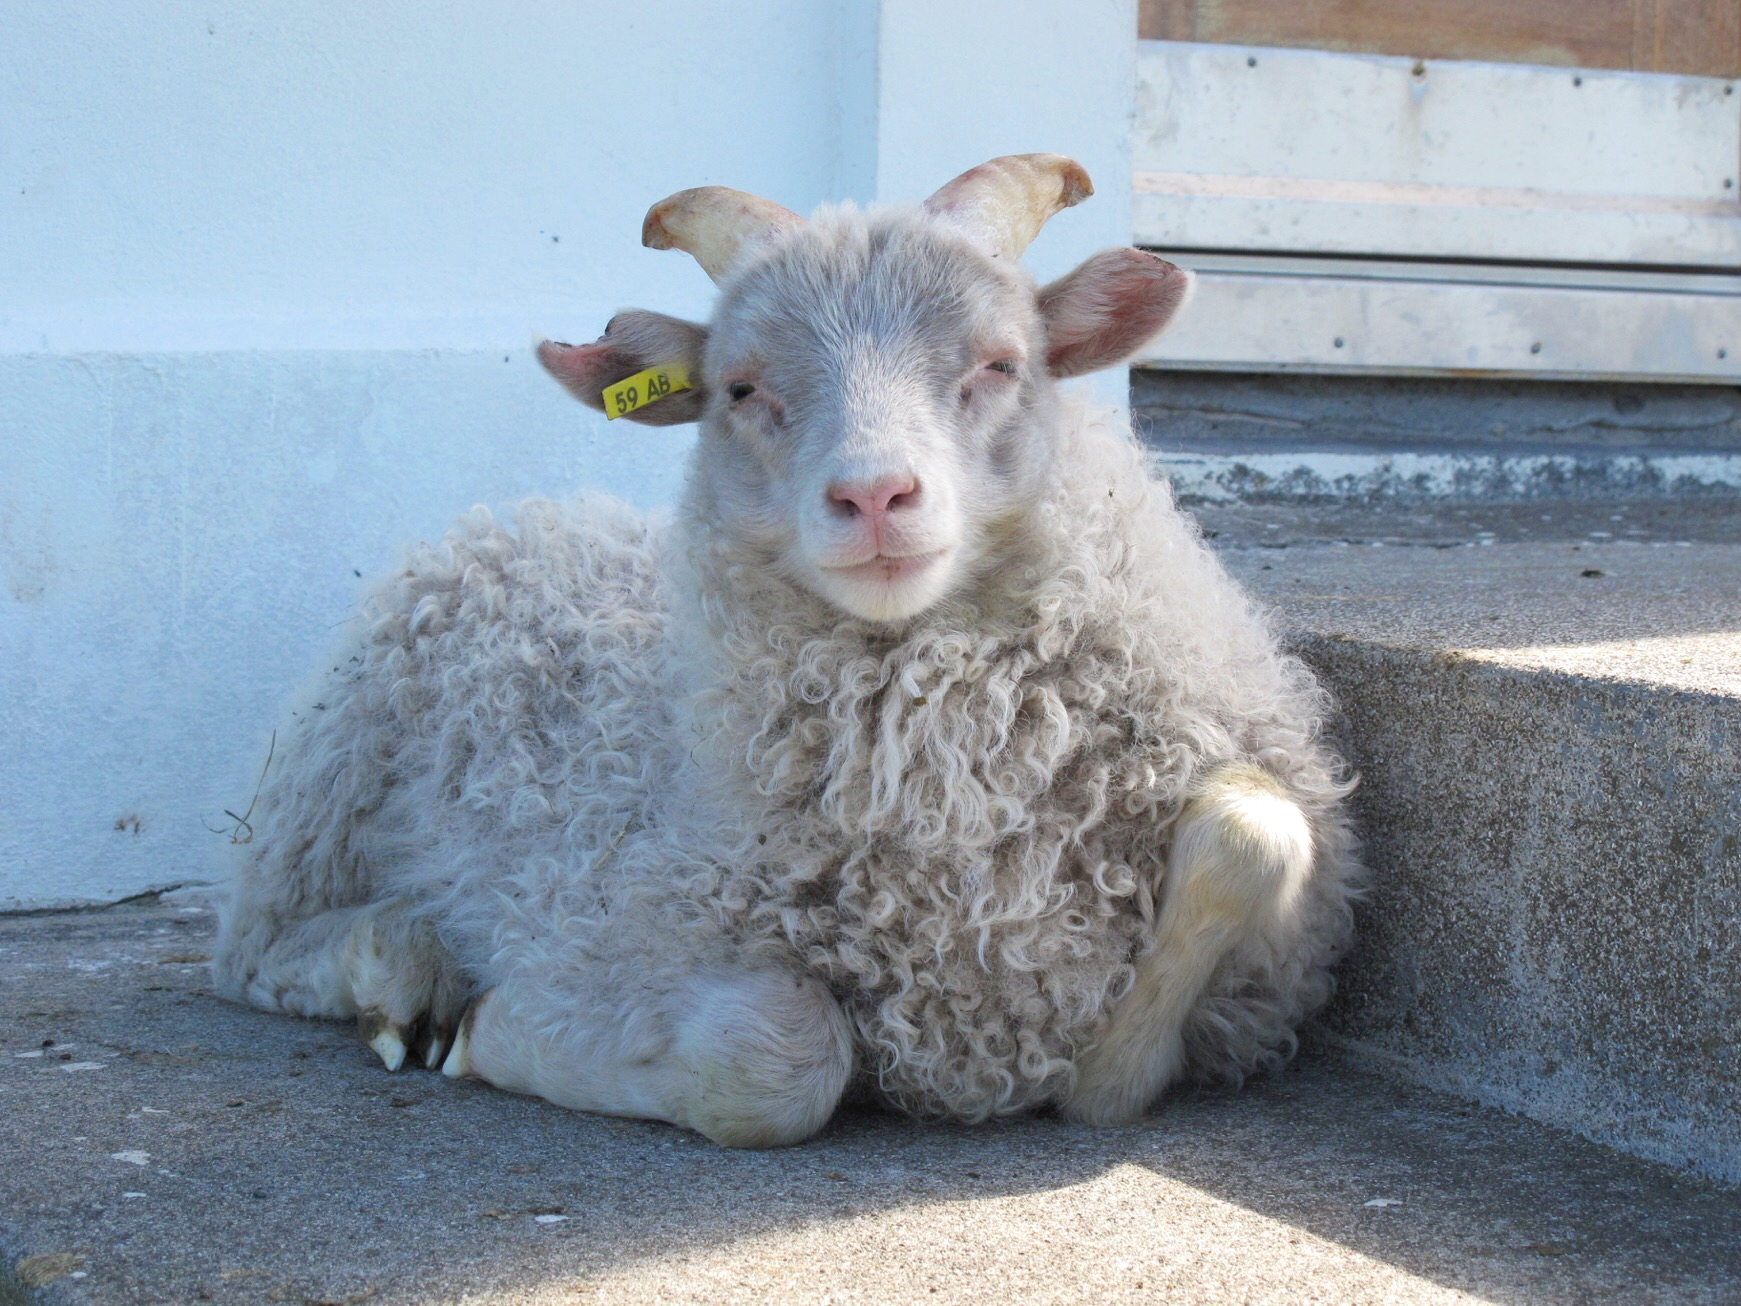 An adorable Icelandic sheep snoozing on the steps of Flateyjarkirkja.